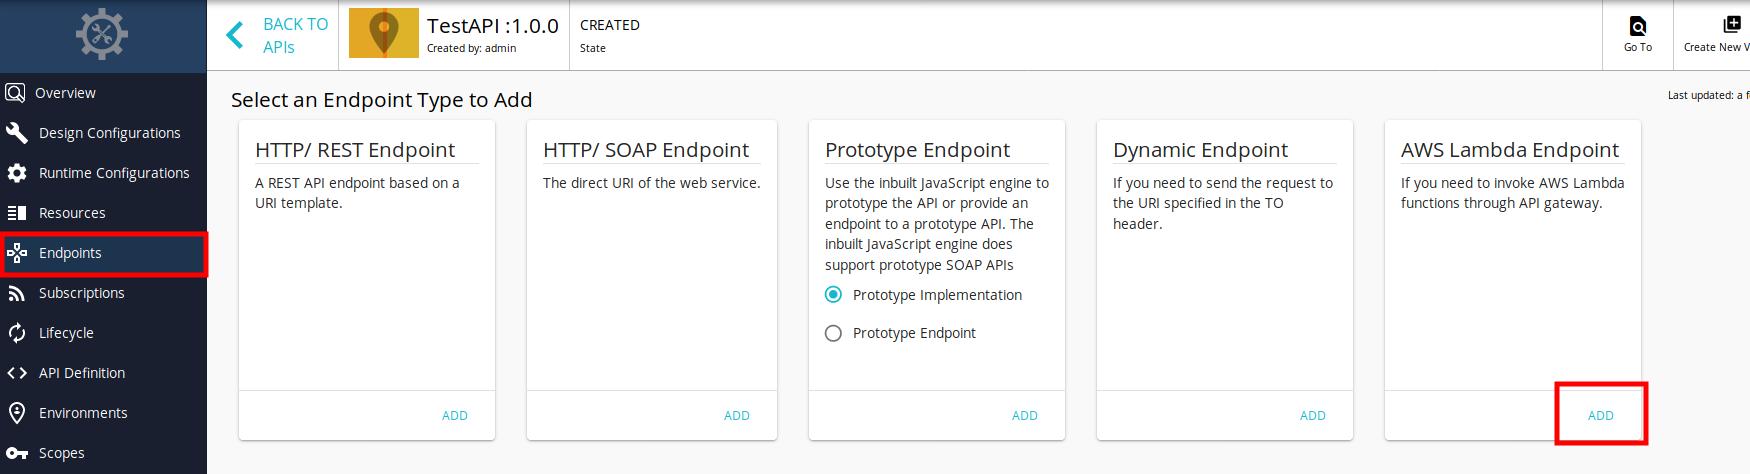 Select AWS Lambda endpoint